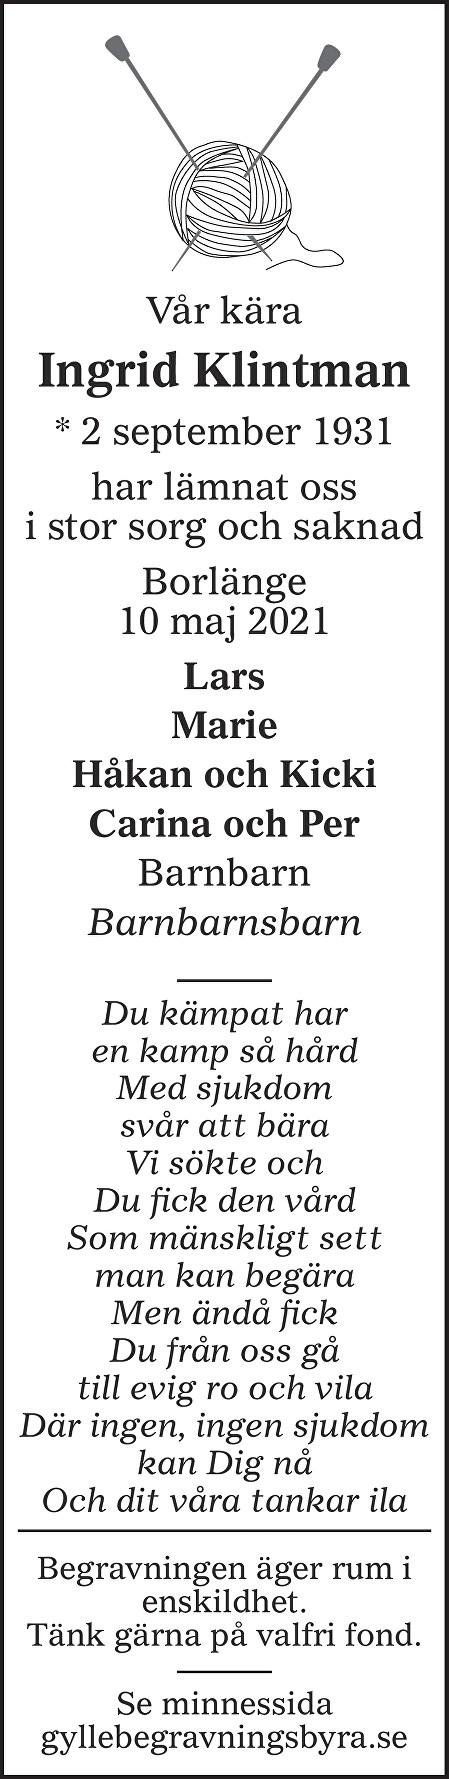 Ingrid Klintman Death notice